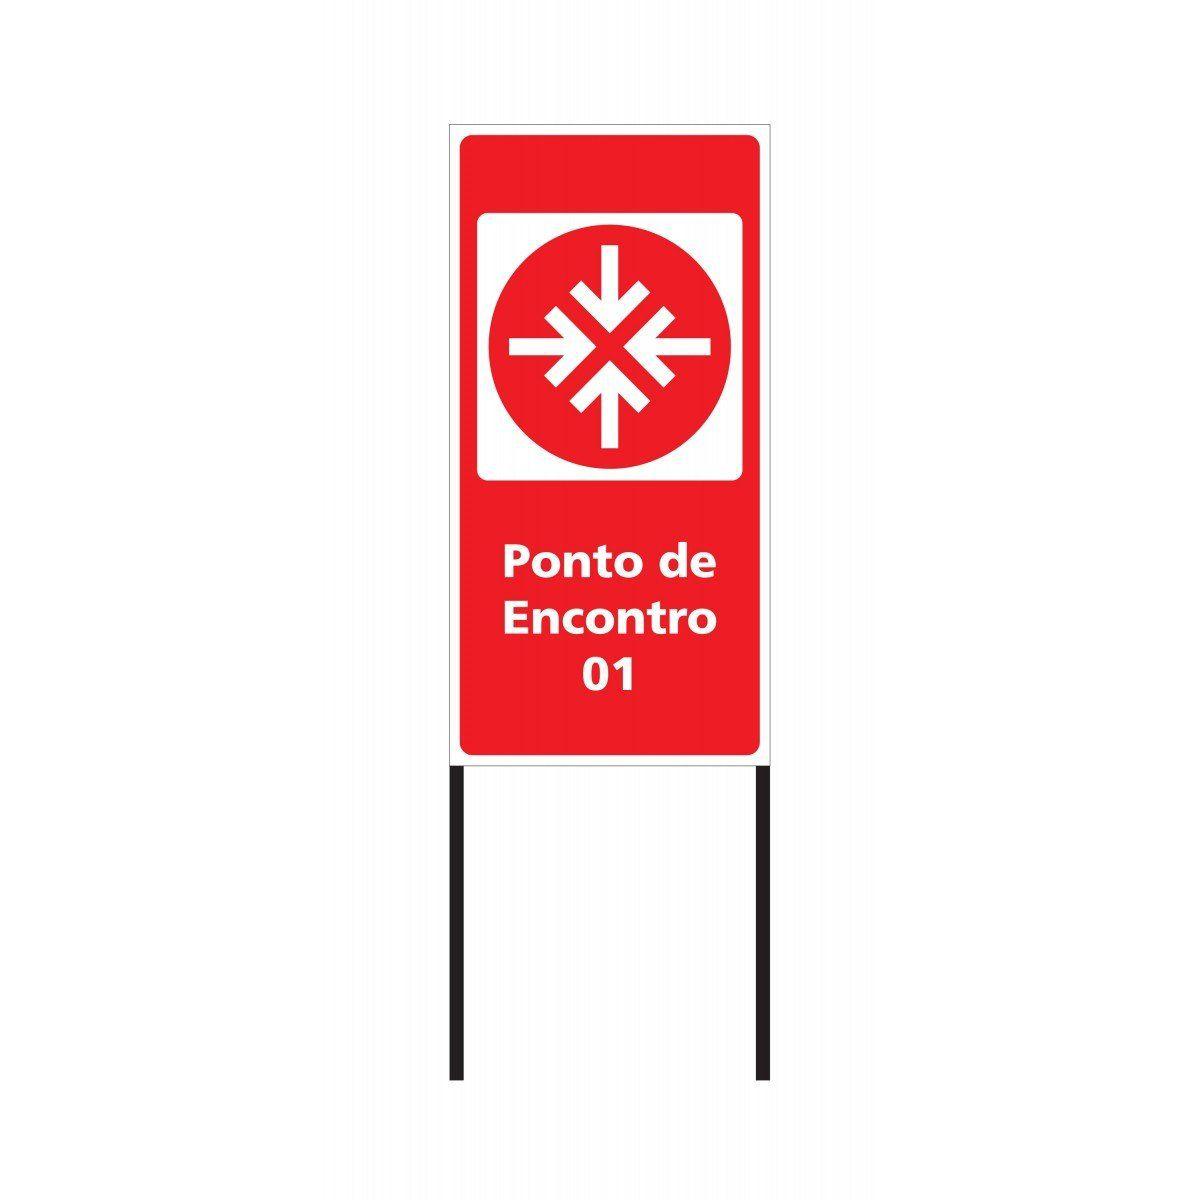 Placa: Ponto de Encontro 75x150 cm - Clace 1 UN